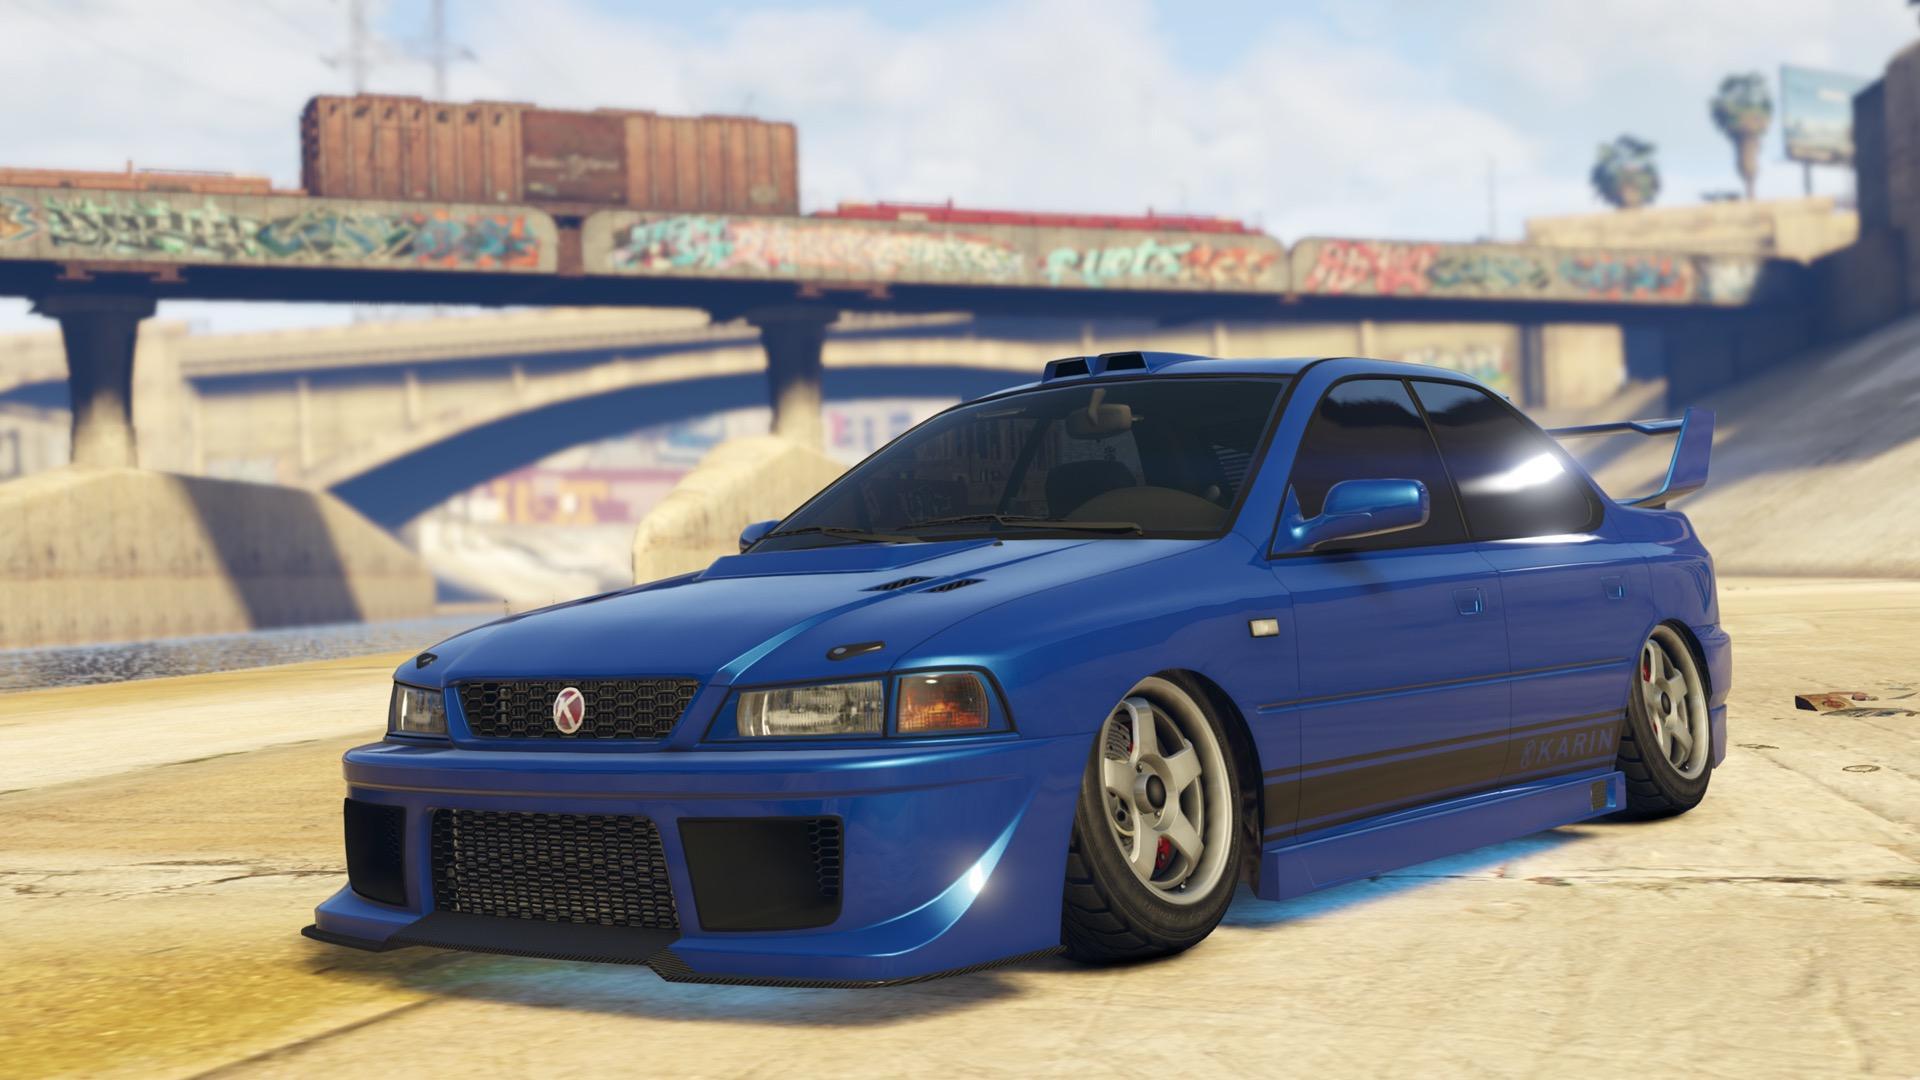 Gta Online Adds The Karin Sultan Classic Sports Car Xboxachievements Com